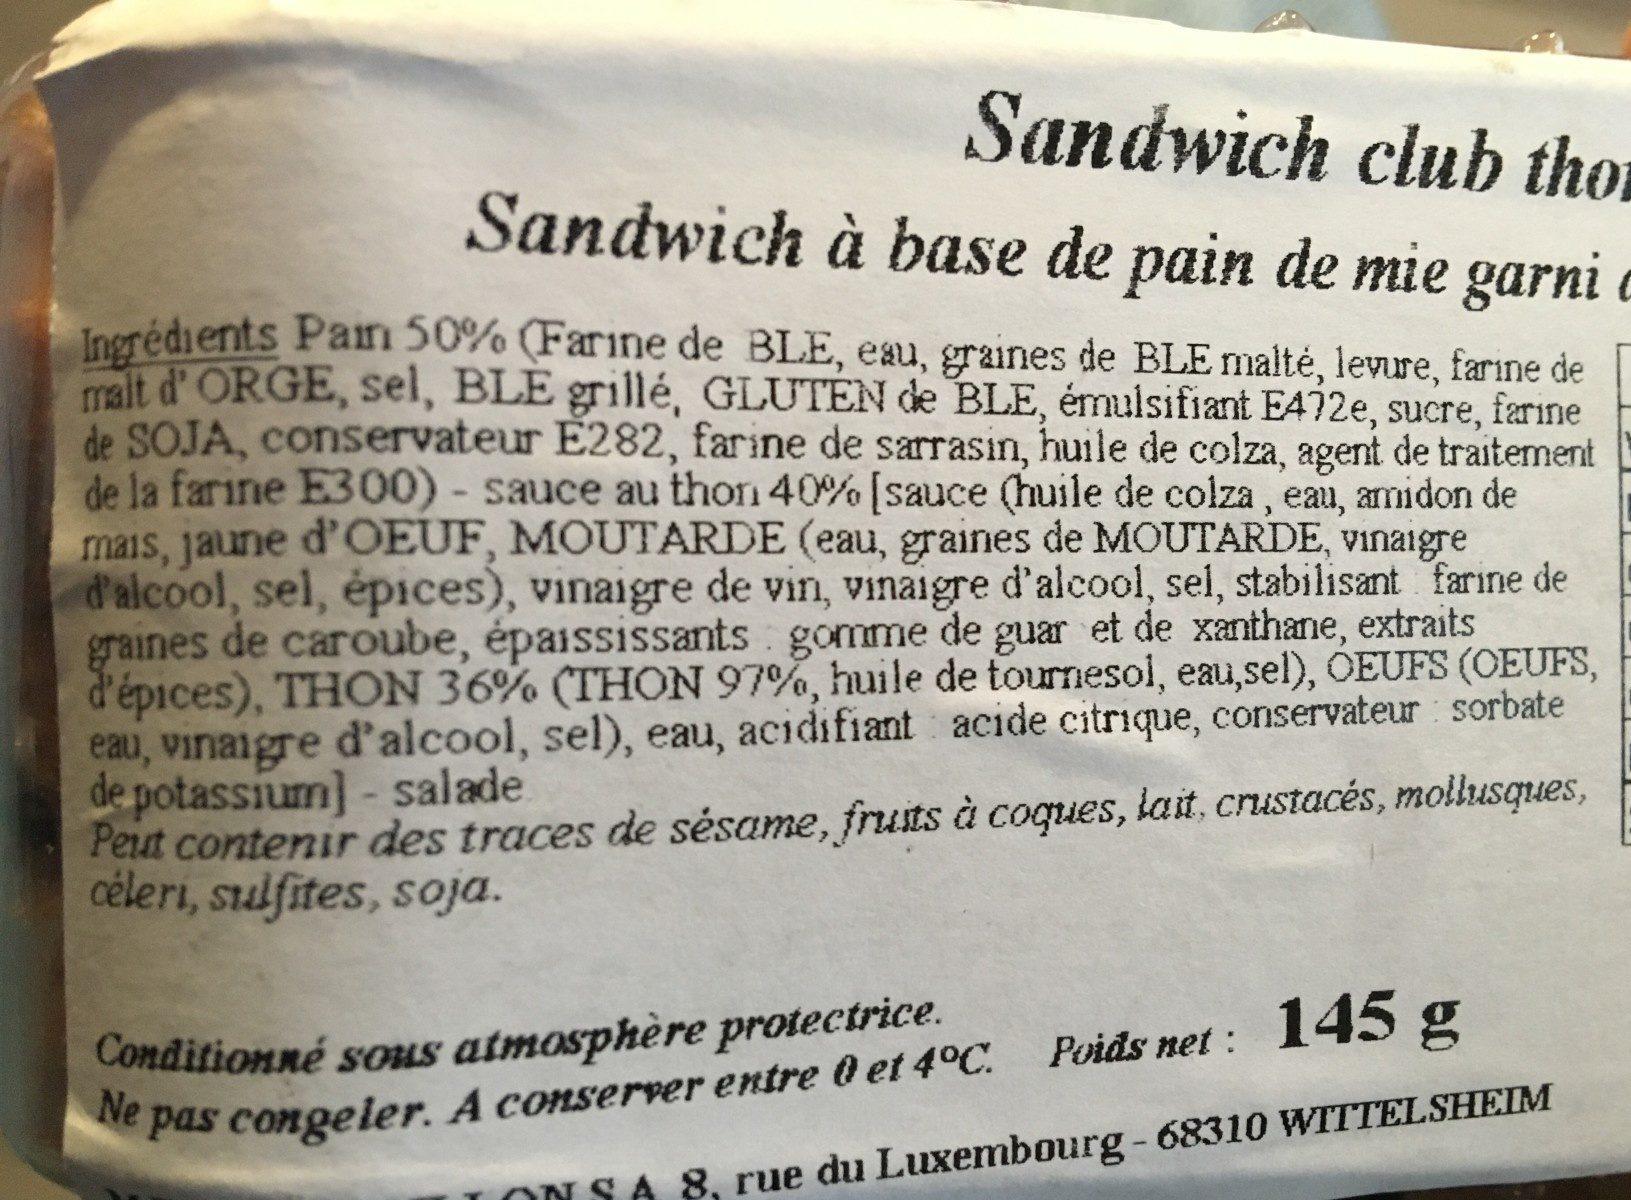 Sandwich club thon - Ingrédients